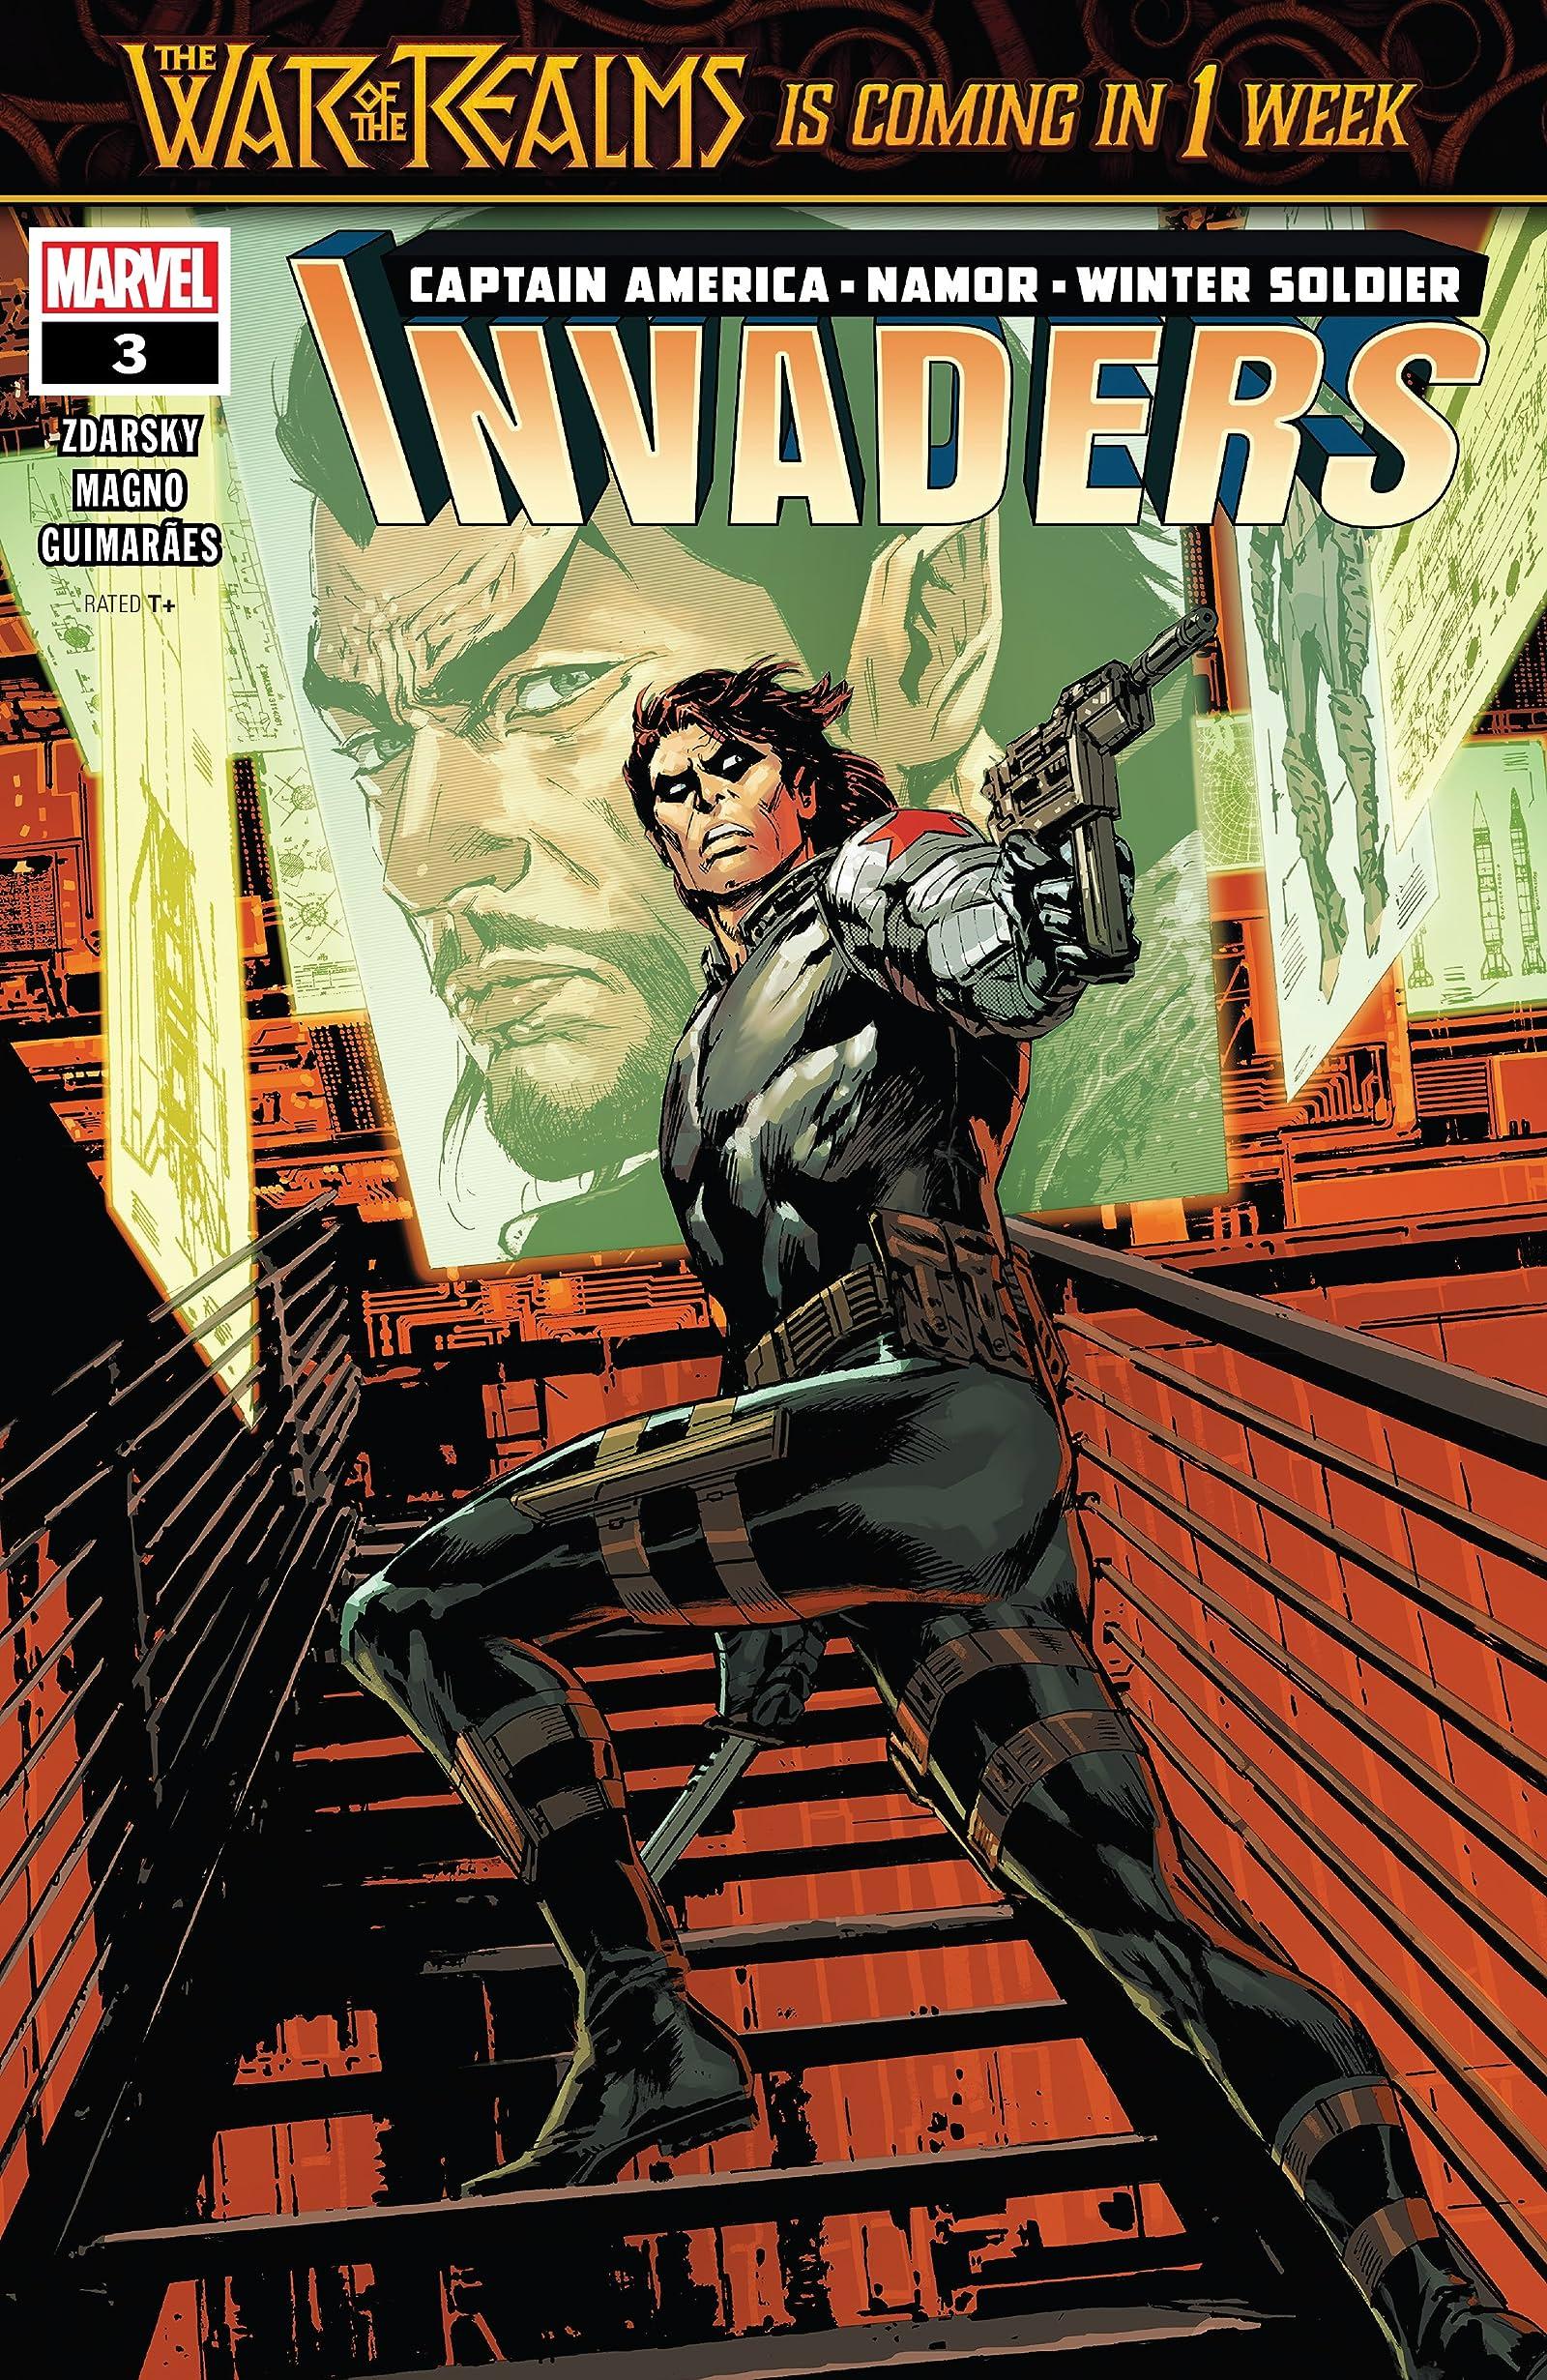 INVADERS #1 MARVEL 2019 1st Print COMIC